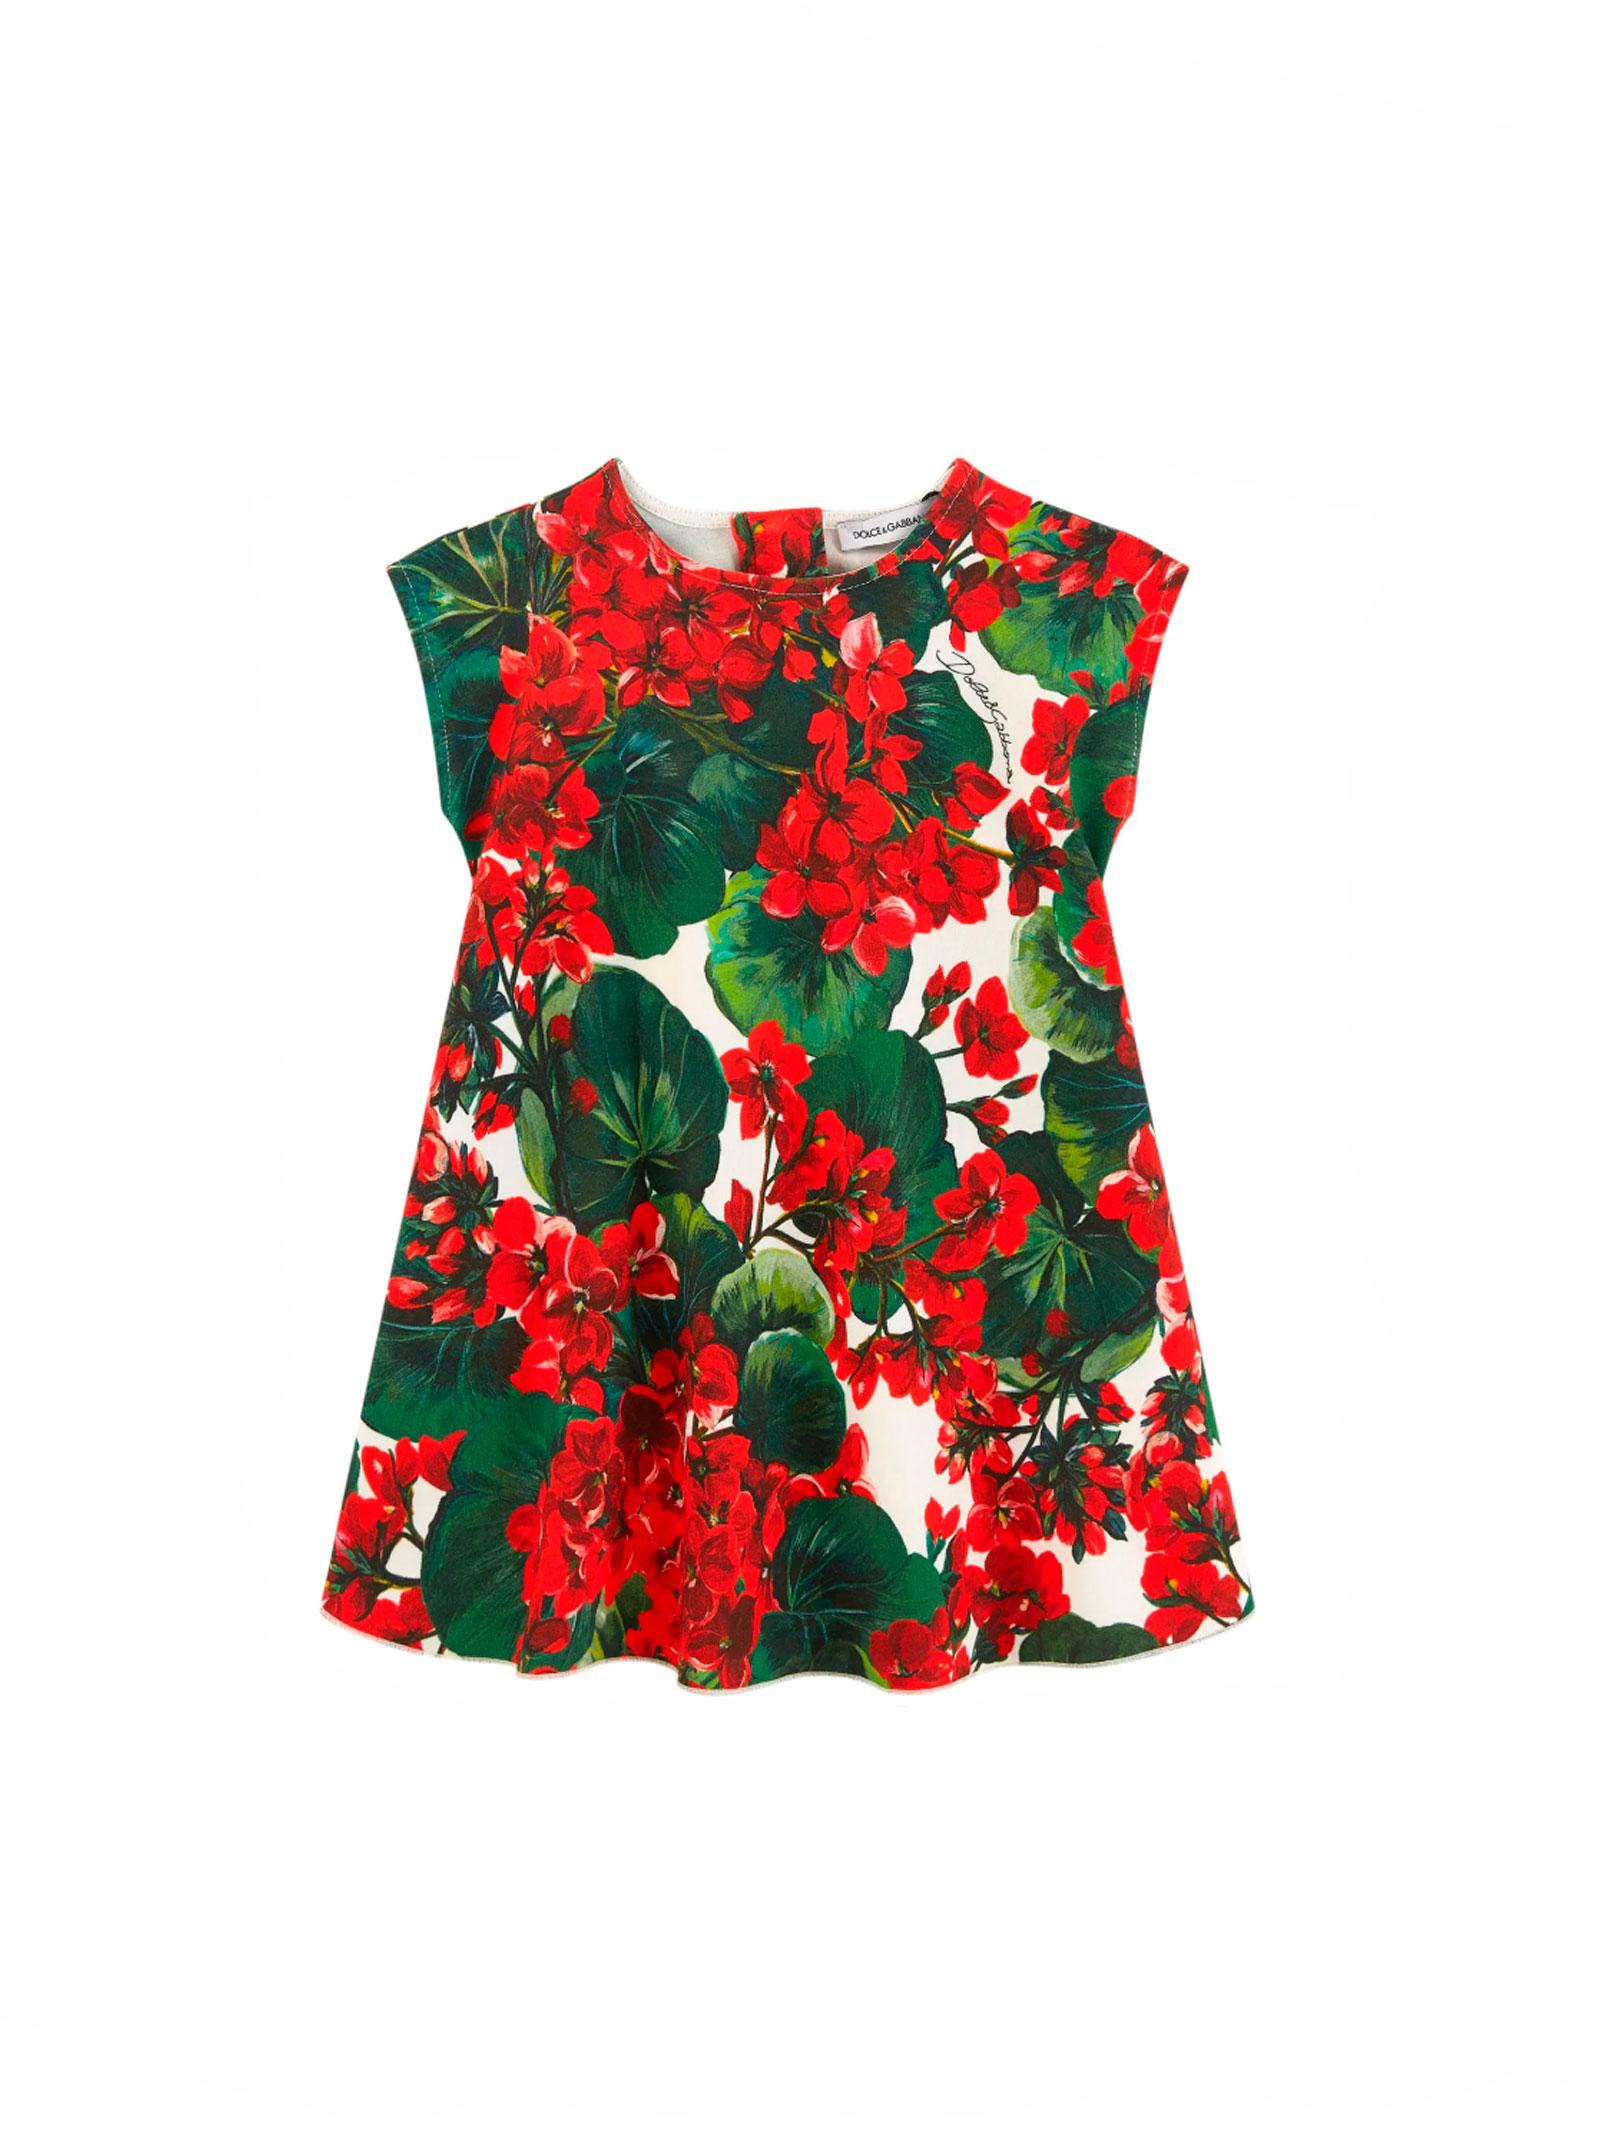 c0ed0f93 ... DOLCE E GABBANA KIDS BABY DRESS Dolce & Gabbana kids   11    L2JD0RFSGO2HAV03 ...